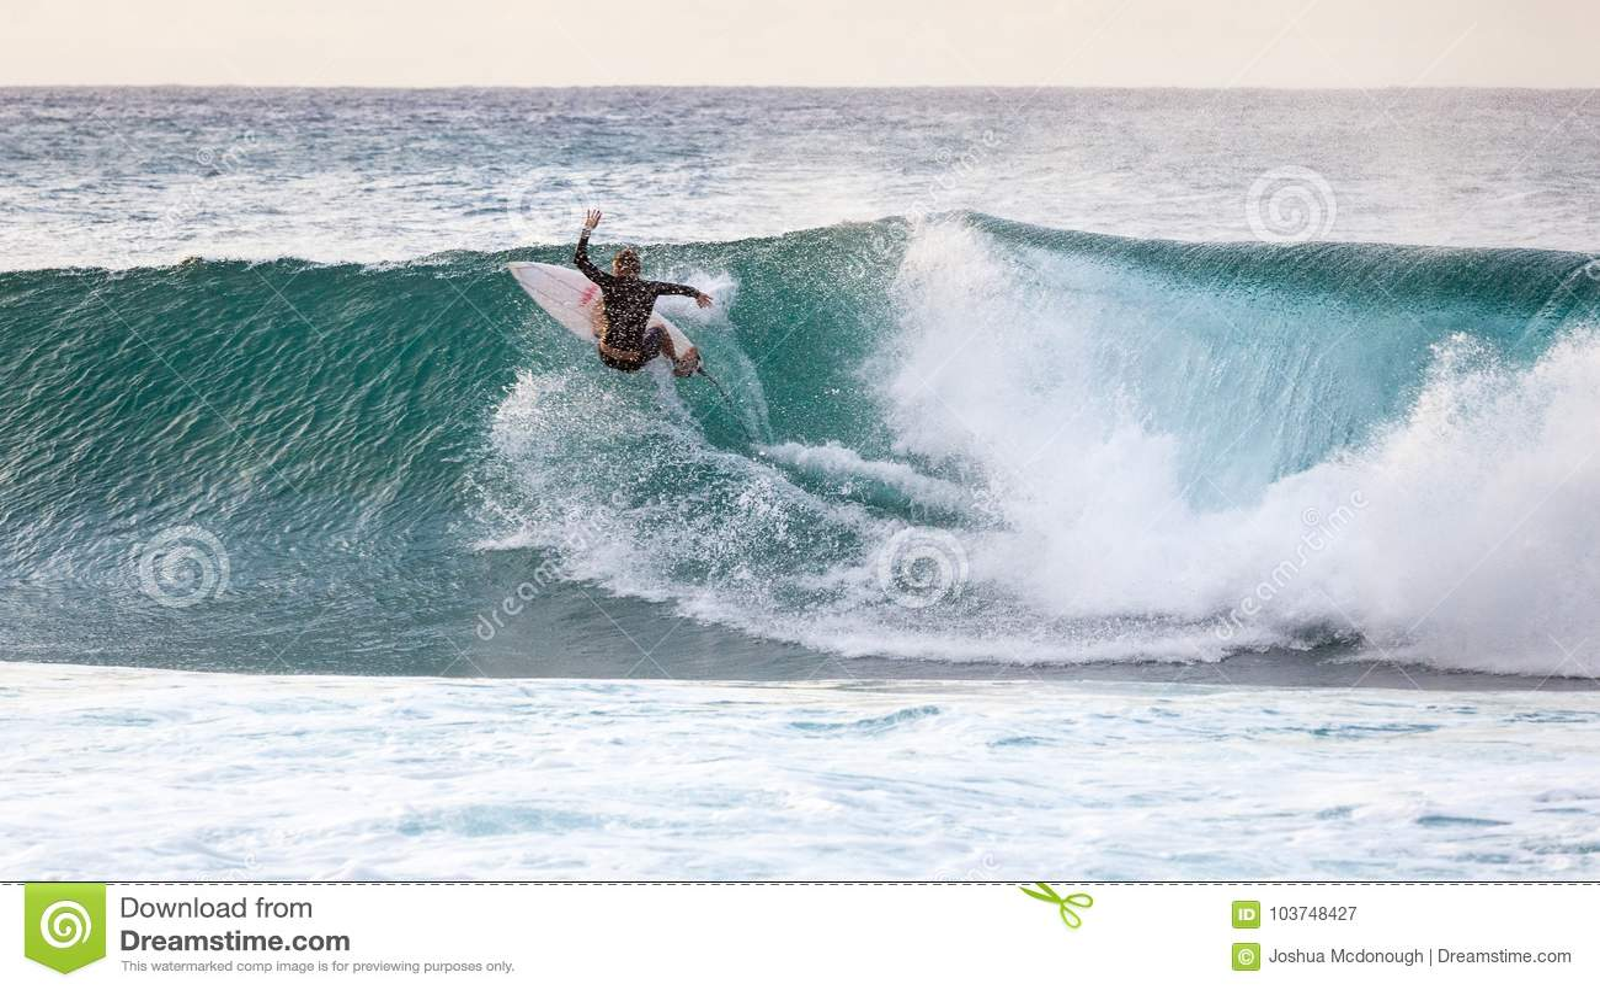 e73b0a5e92 Surfing on the Banzai Pipeline wave break on Oahu North Shore in Hawaii